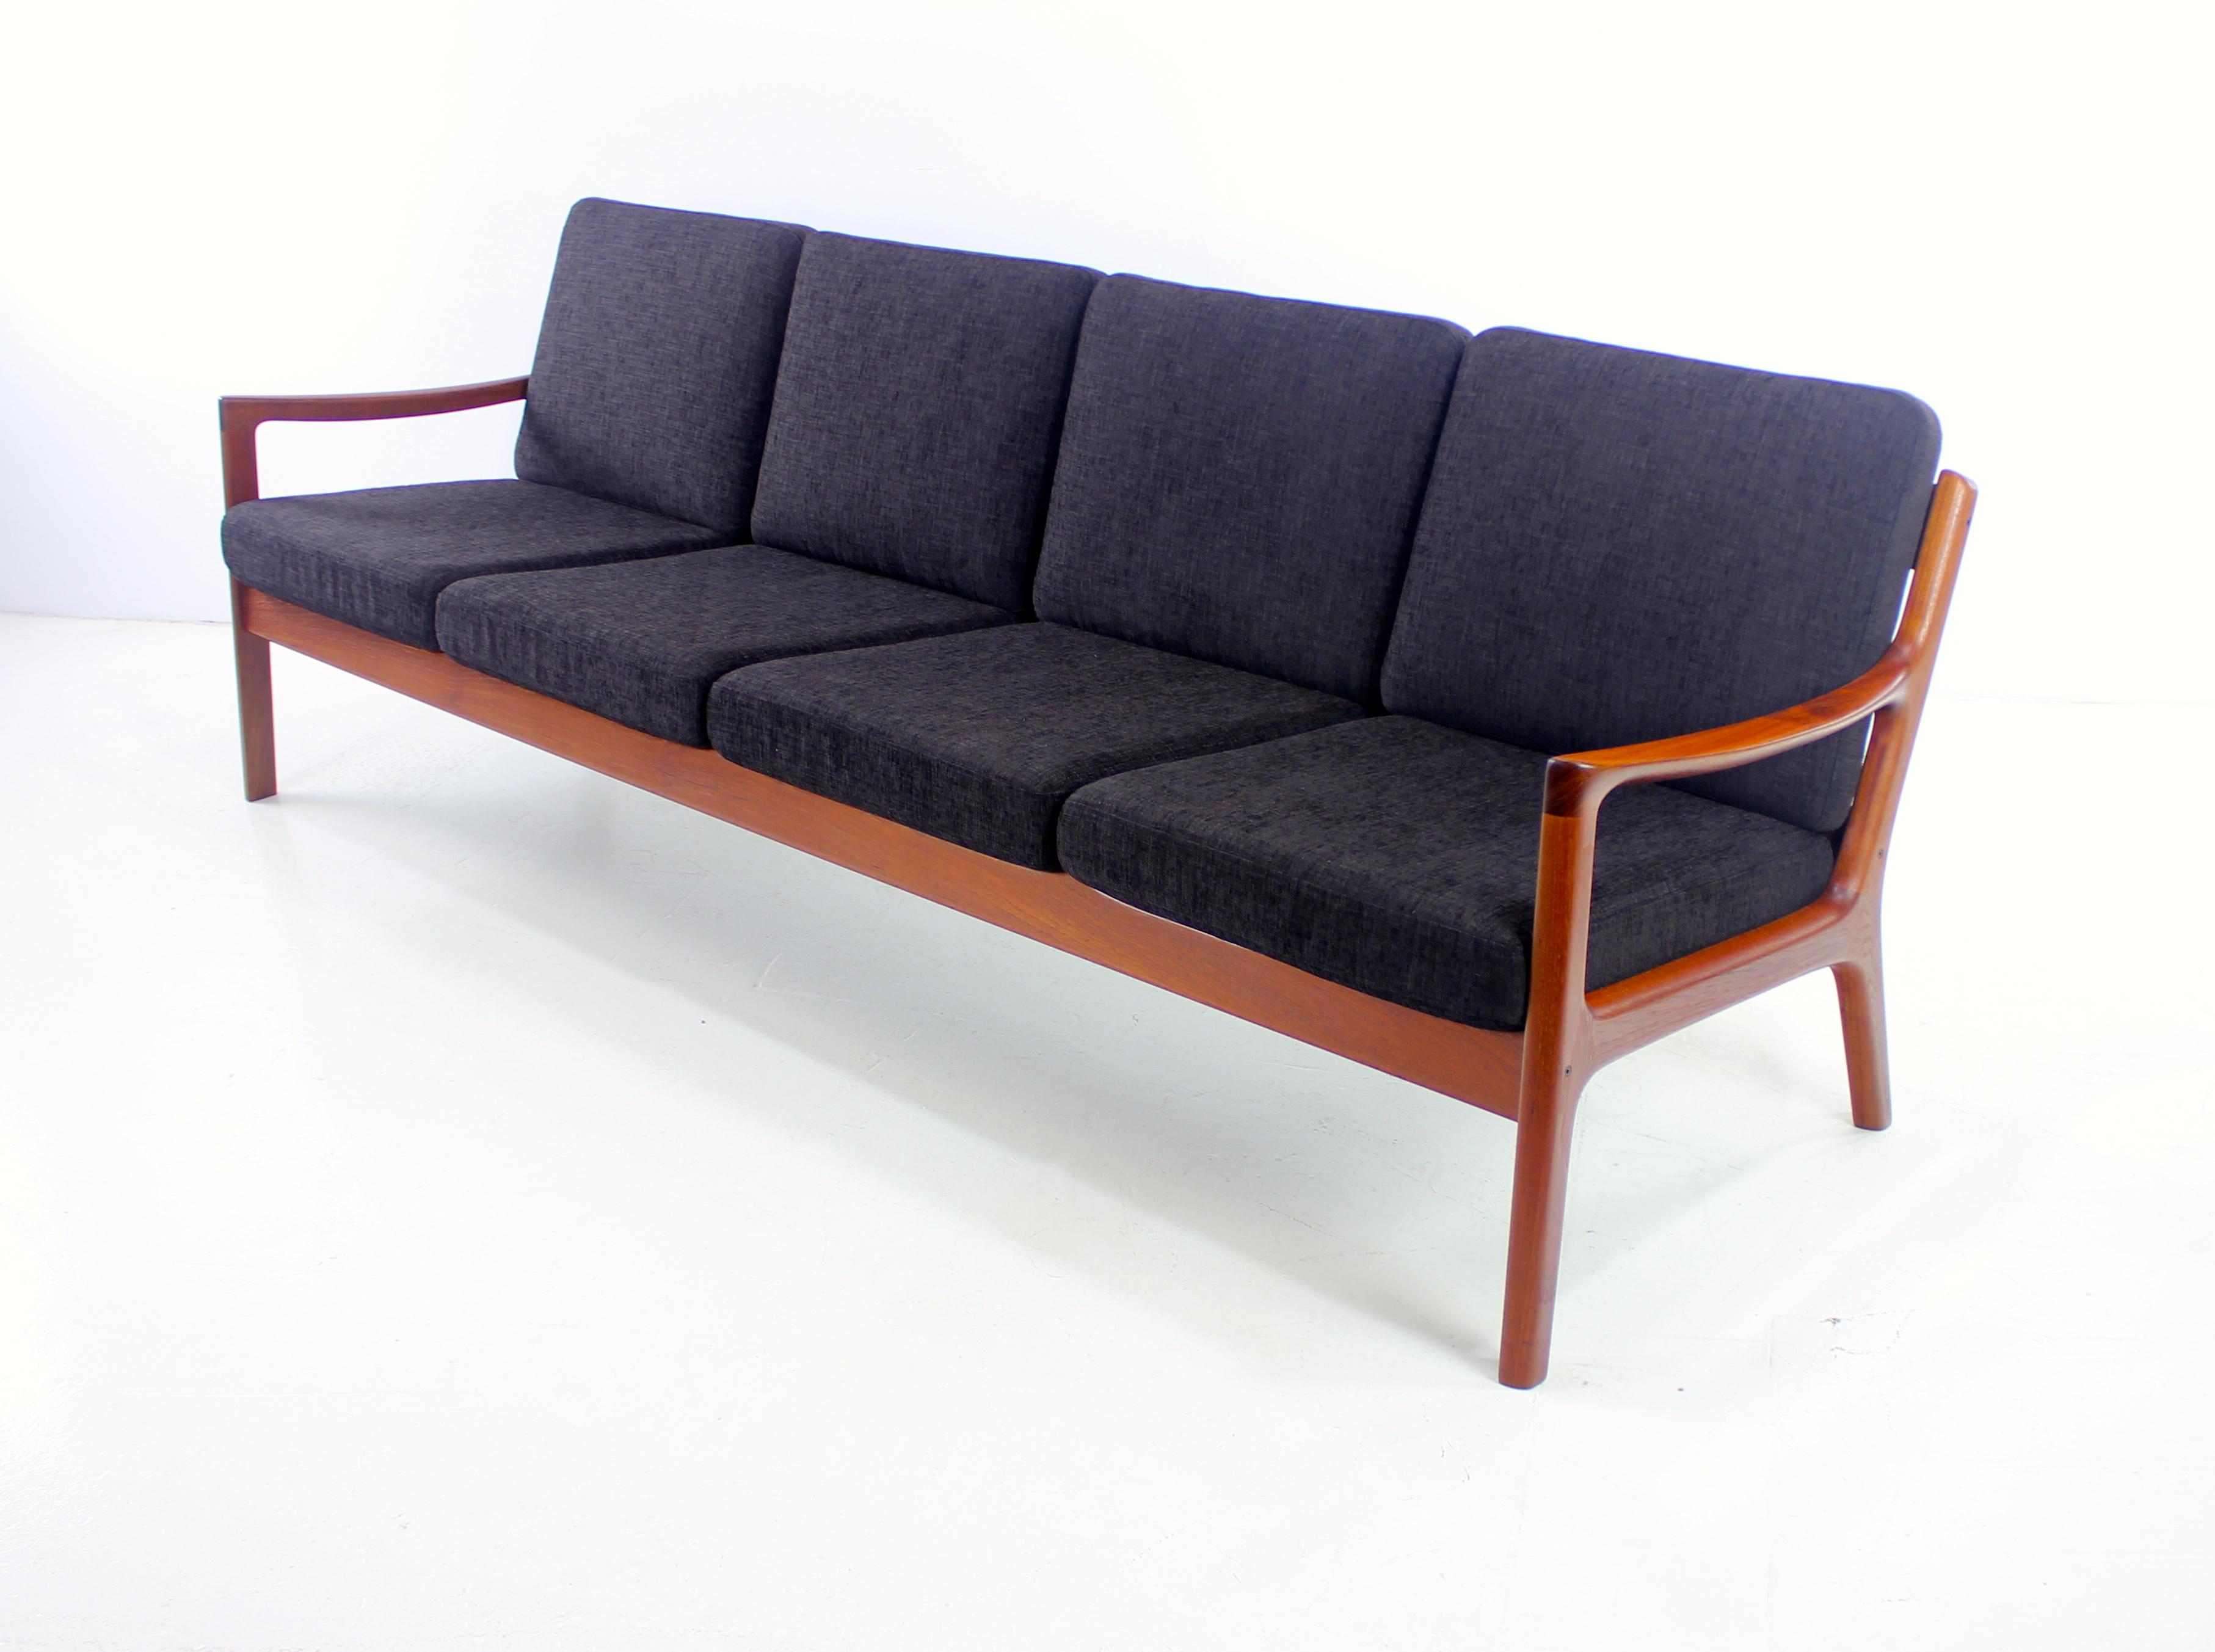 Classic Danish Modern Teak Framed Sofa Designed by Ole Wanscher